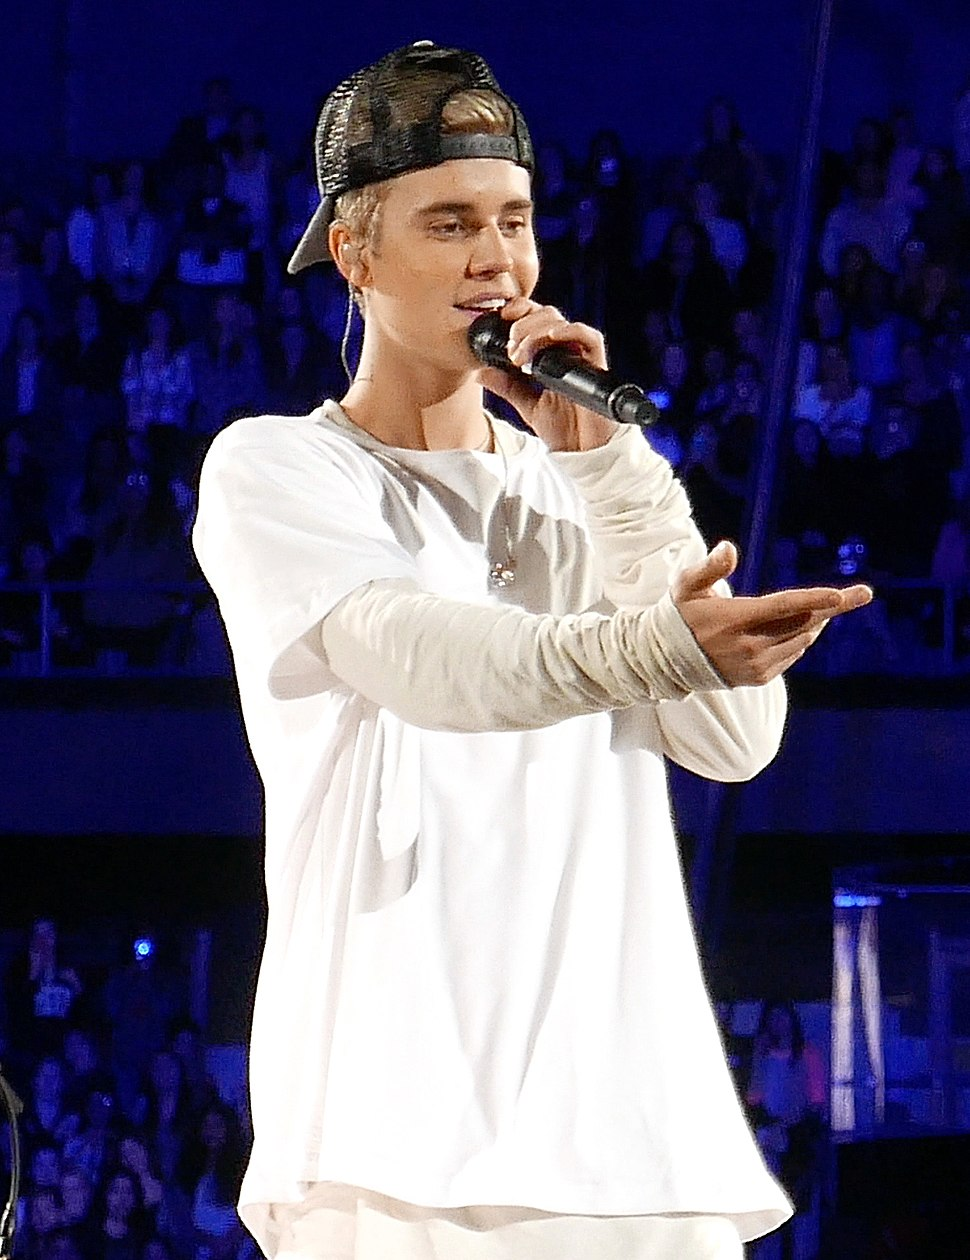 Justin Bieber in Rosemont, Illinois (2015)